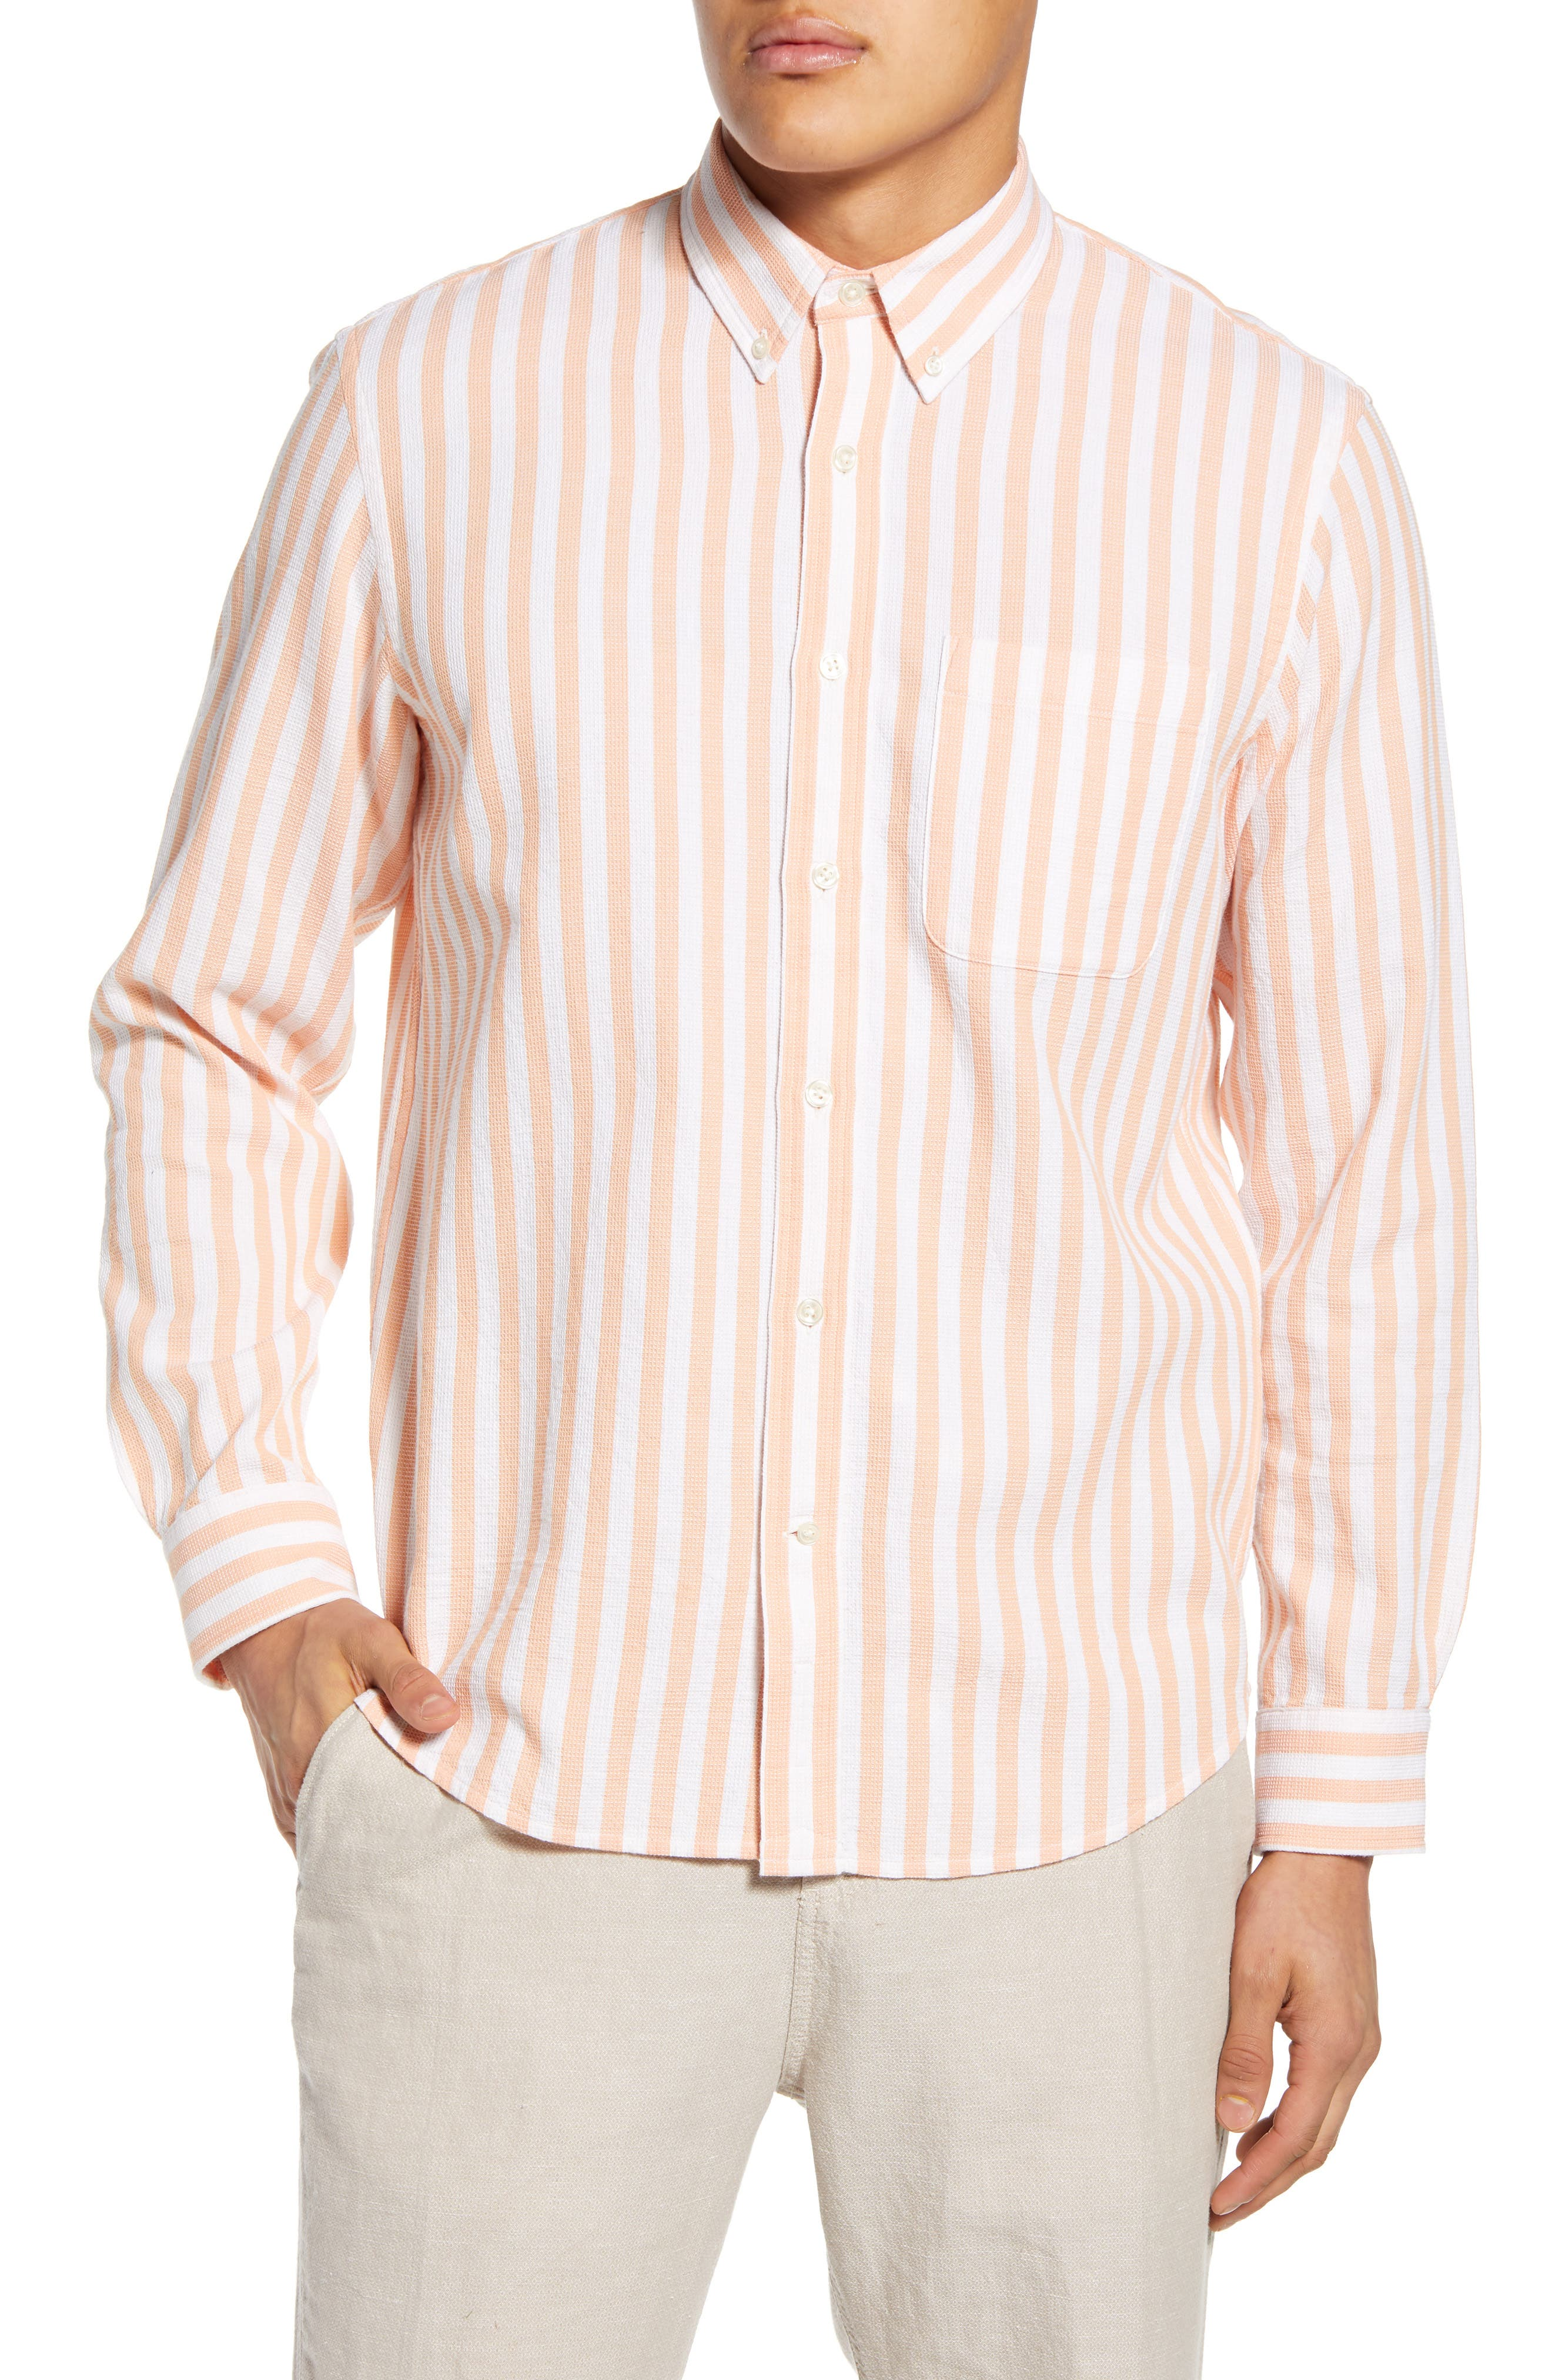 CLUB MONACO Slim Fit Waffle Stripe Button-Down Shirt at Nordstrom Rack